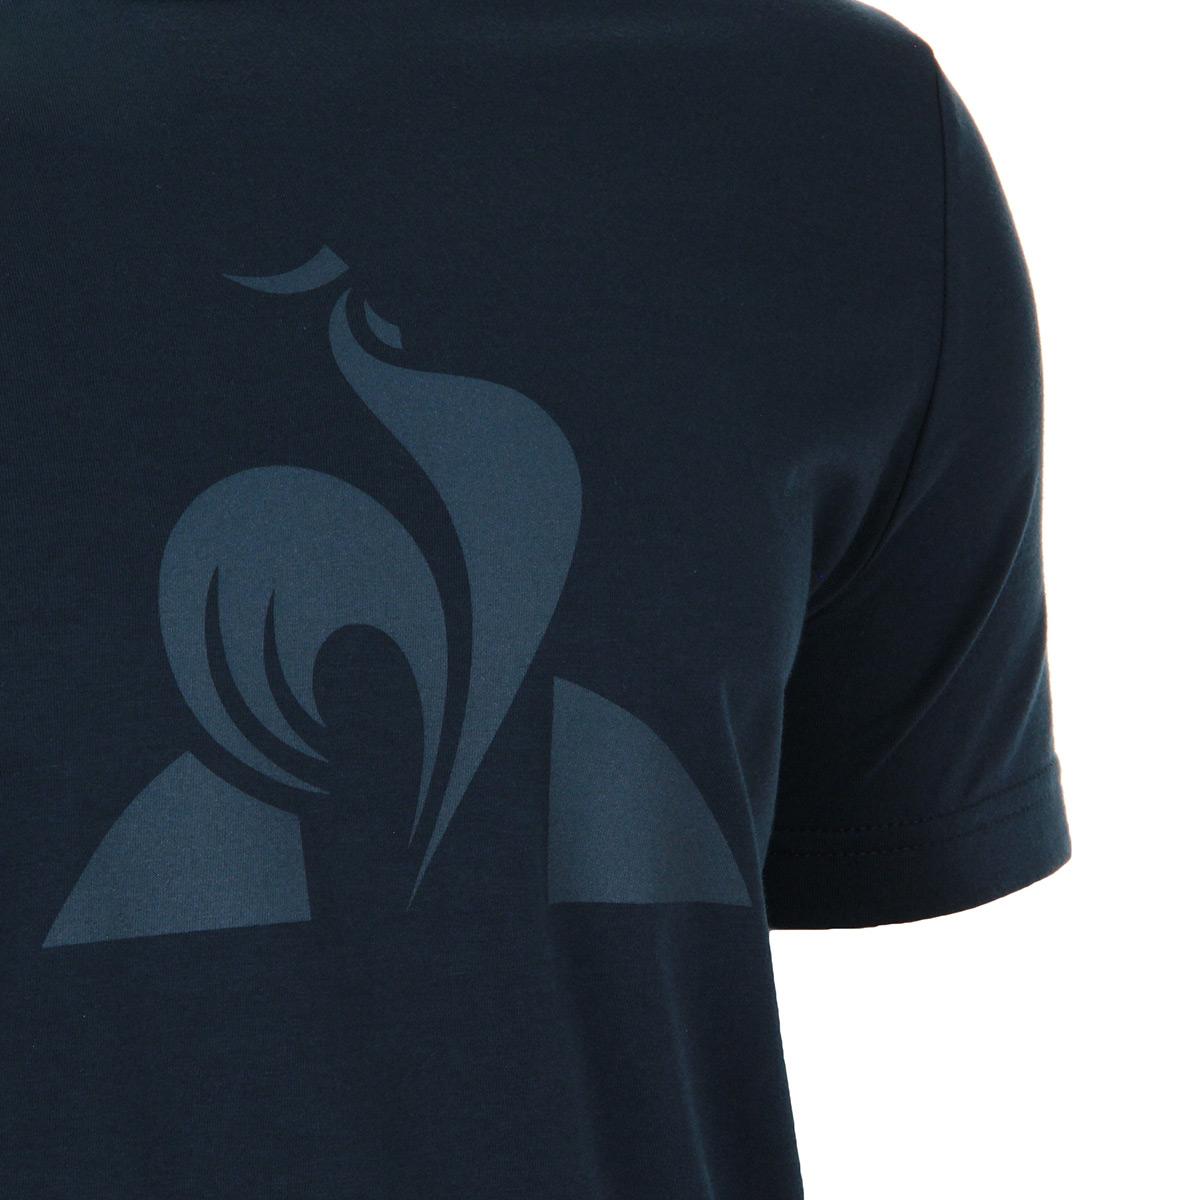 Vêtement T-Shirts Le Coq Sportif homme Ess Tee SS blues taille Bleu ... 64cd3ed81b2